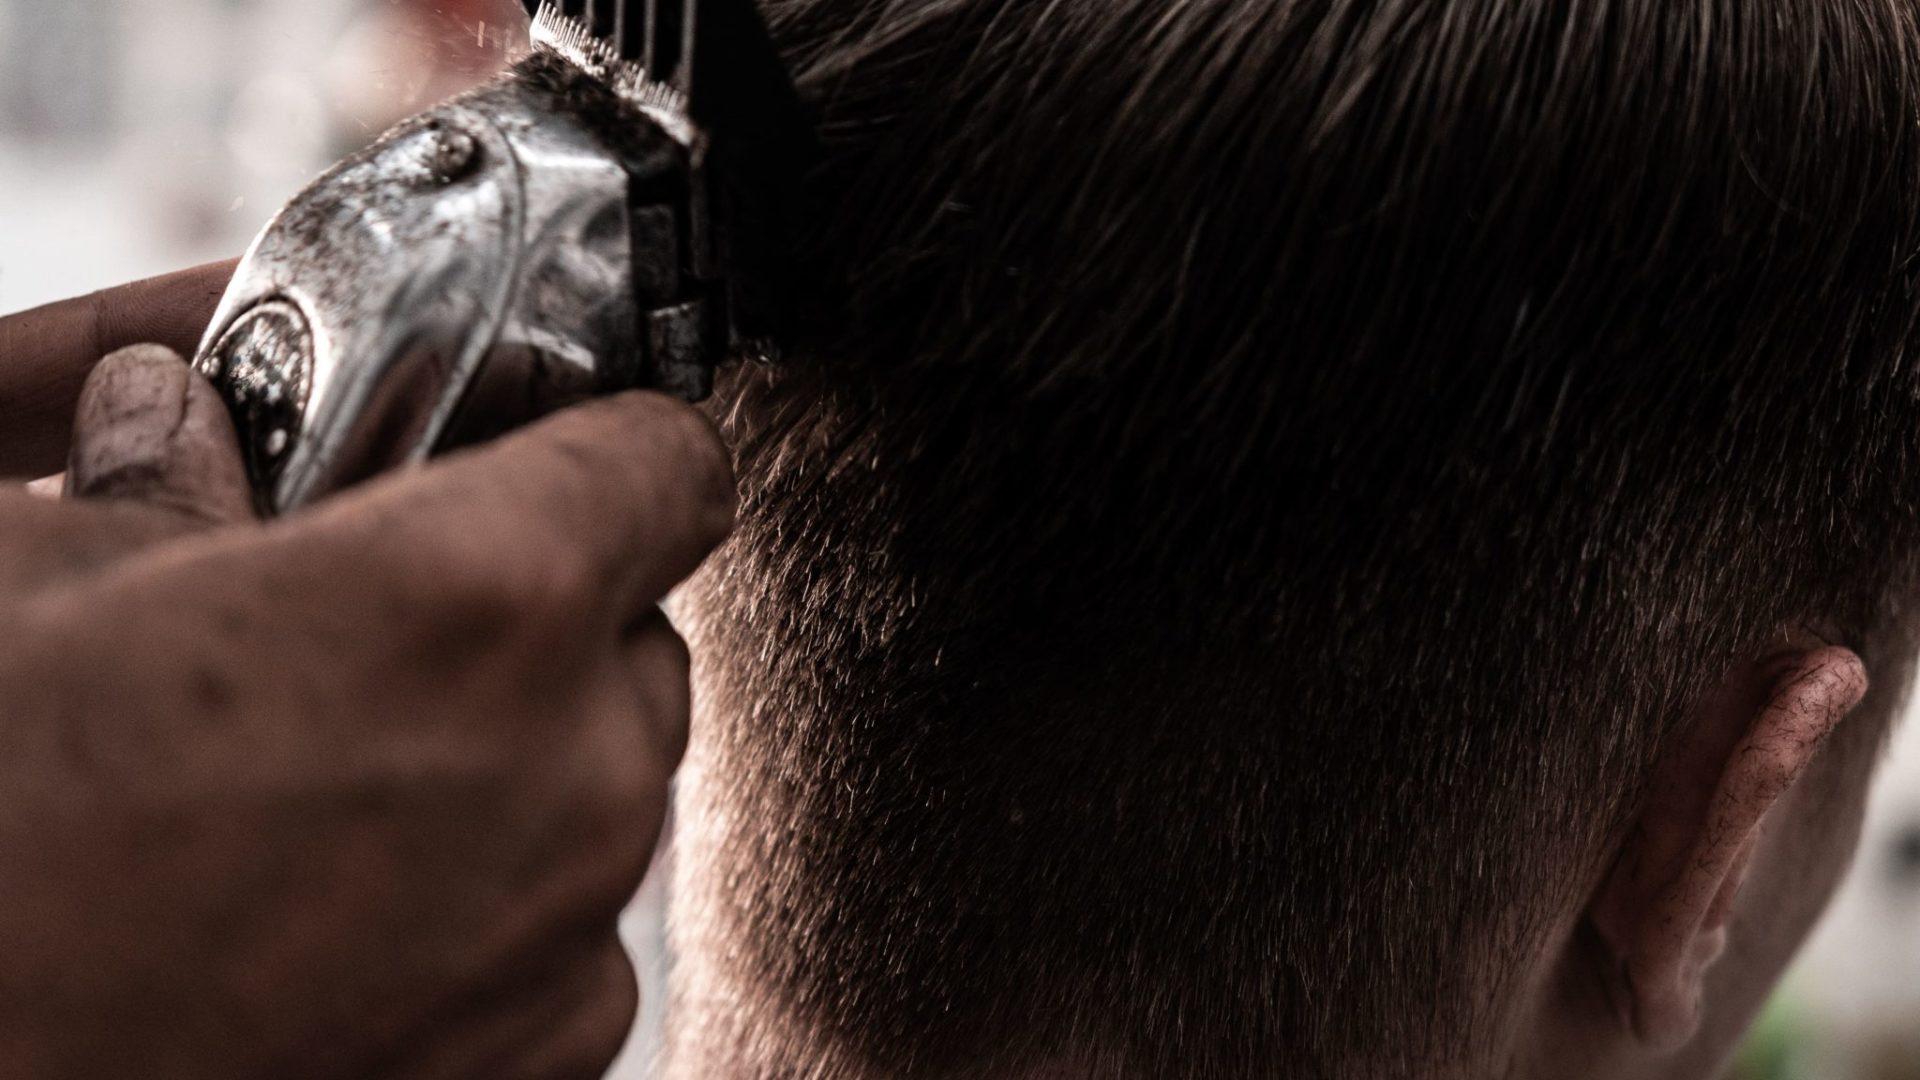 NoCap Barbers, Barber Shop Wien 1010 Wien